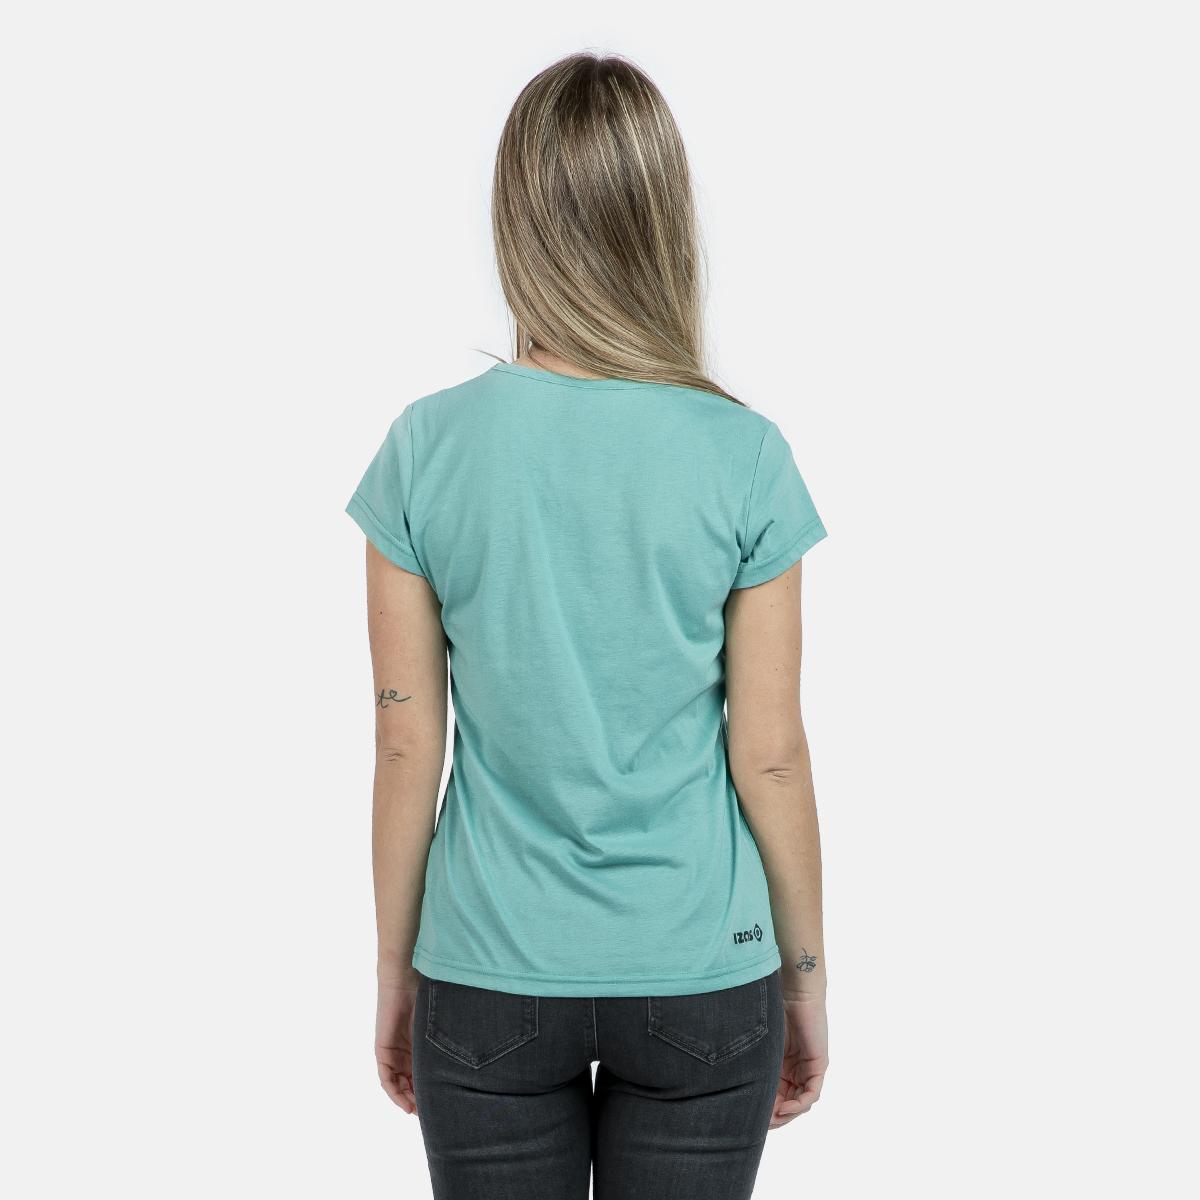 WOMAN'S SAS T-SHIRT GREEN